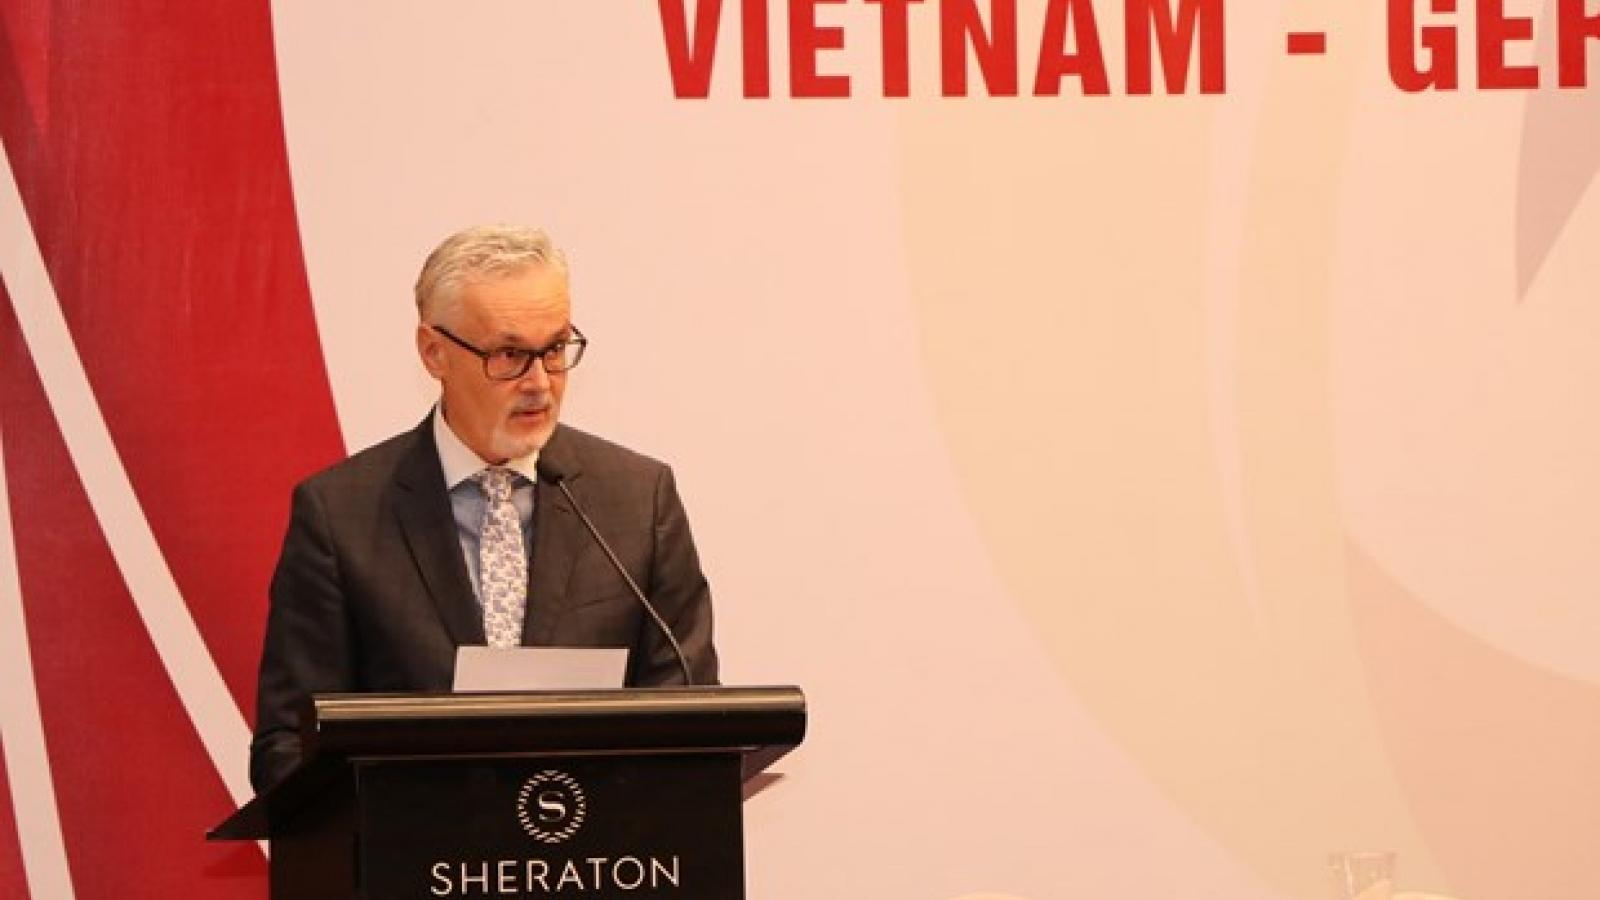 Forum promotes Vietnam - Germany economic, trade cooperation